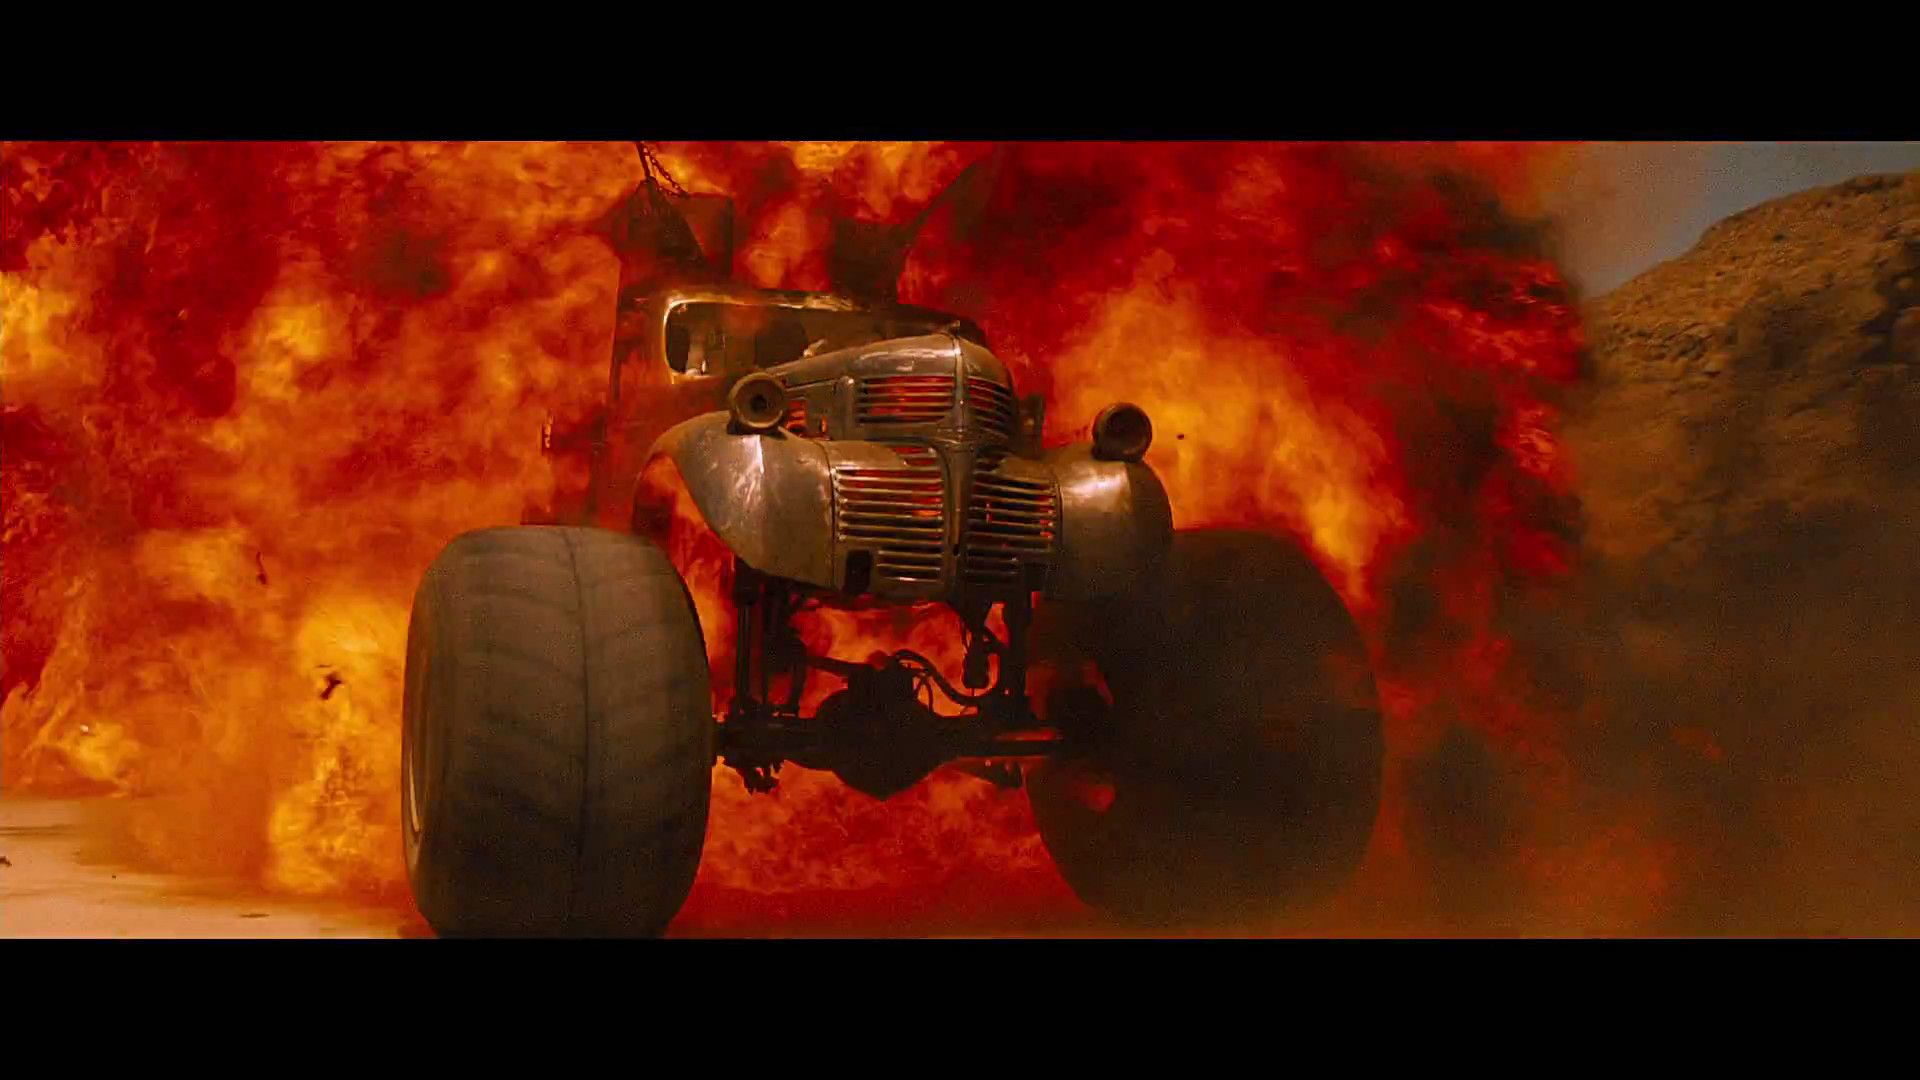 Mad Max Fury Road Monster Truck Explosion 2 | Monster Trucks | Pinterest